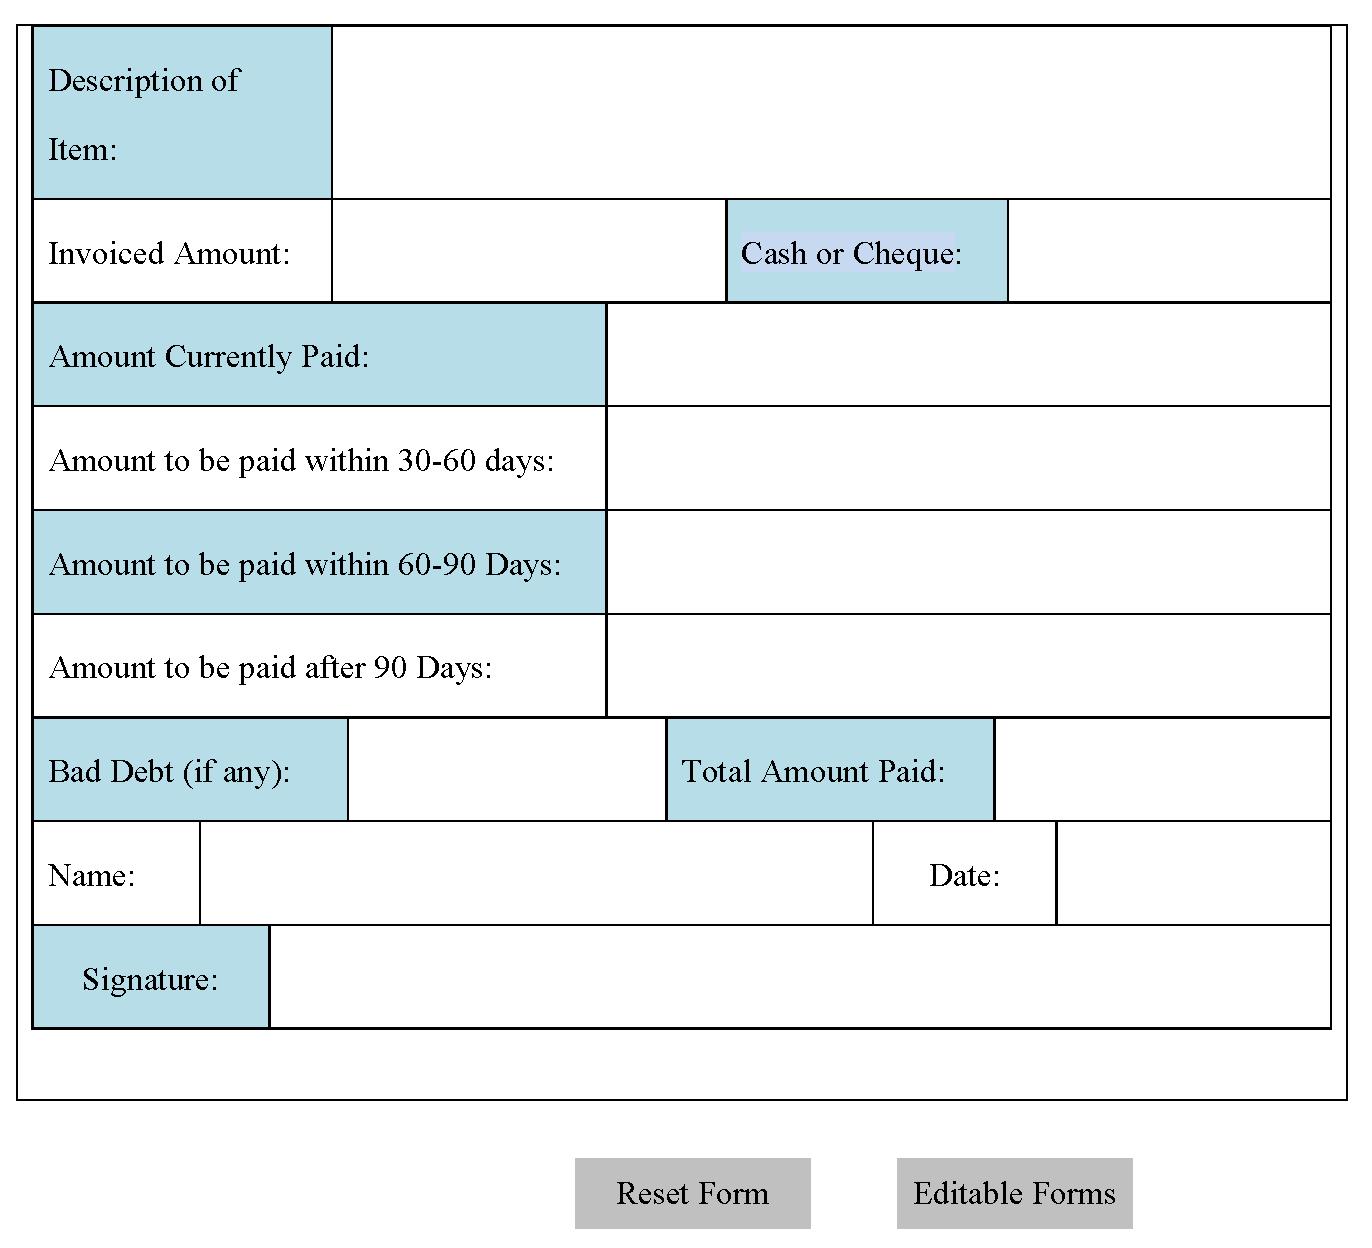 Accounts Payable Form | Editable Forms